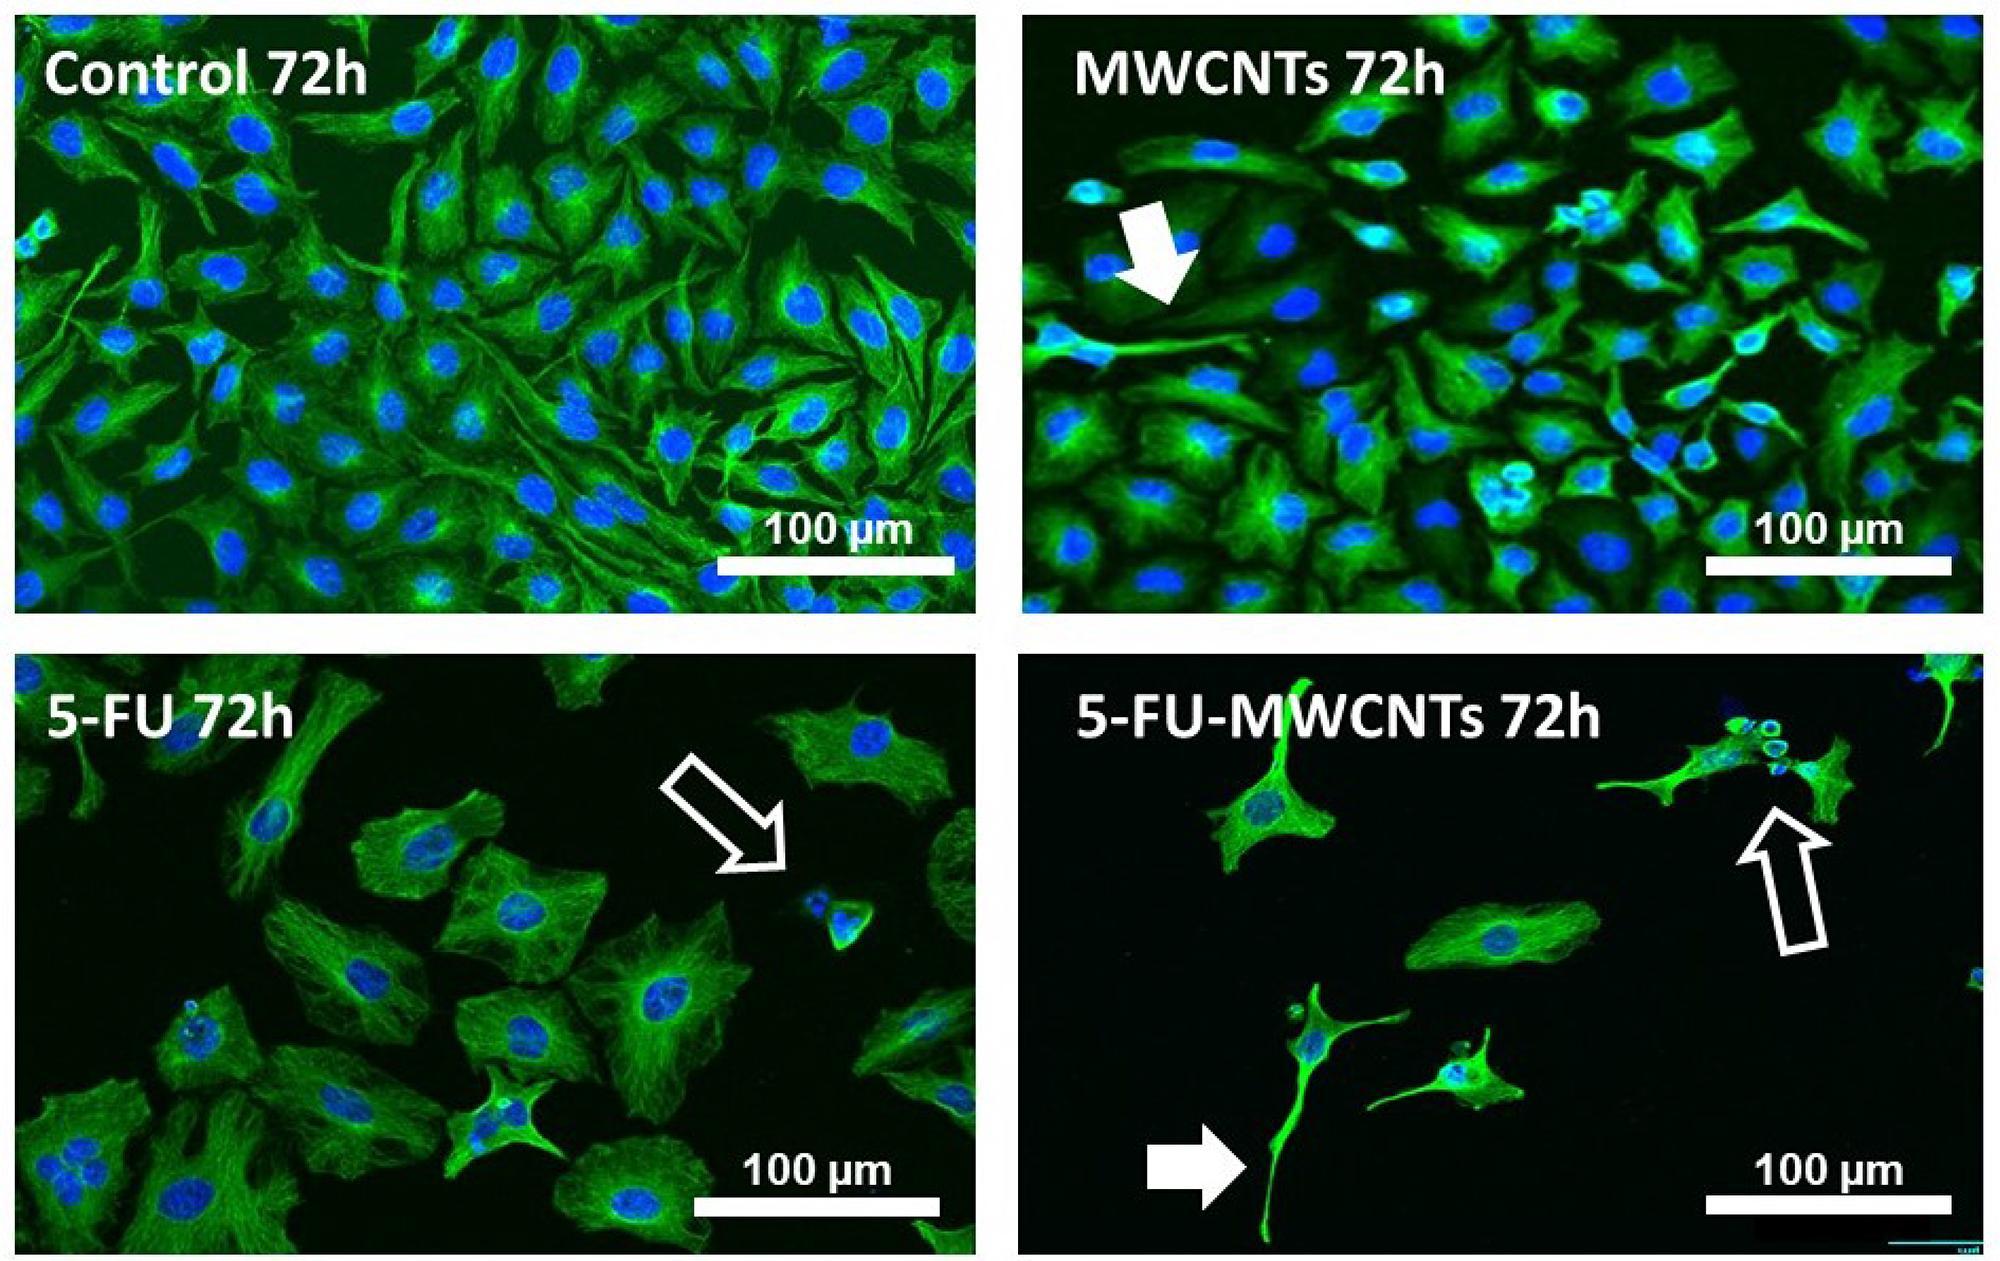 Anti-proliferative and cytotoxic effect of 5-FU-MWCNTs in vitro.